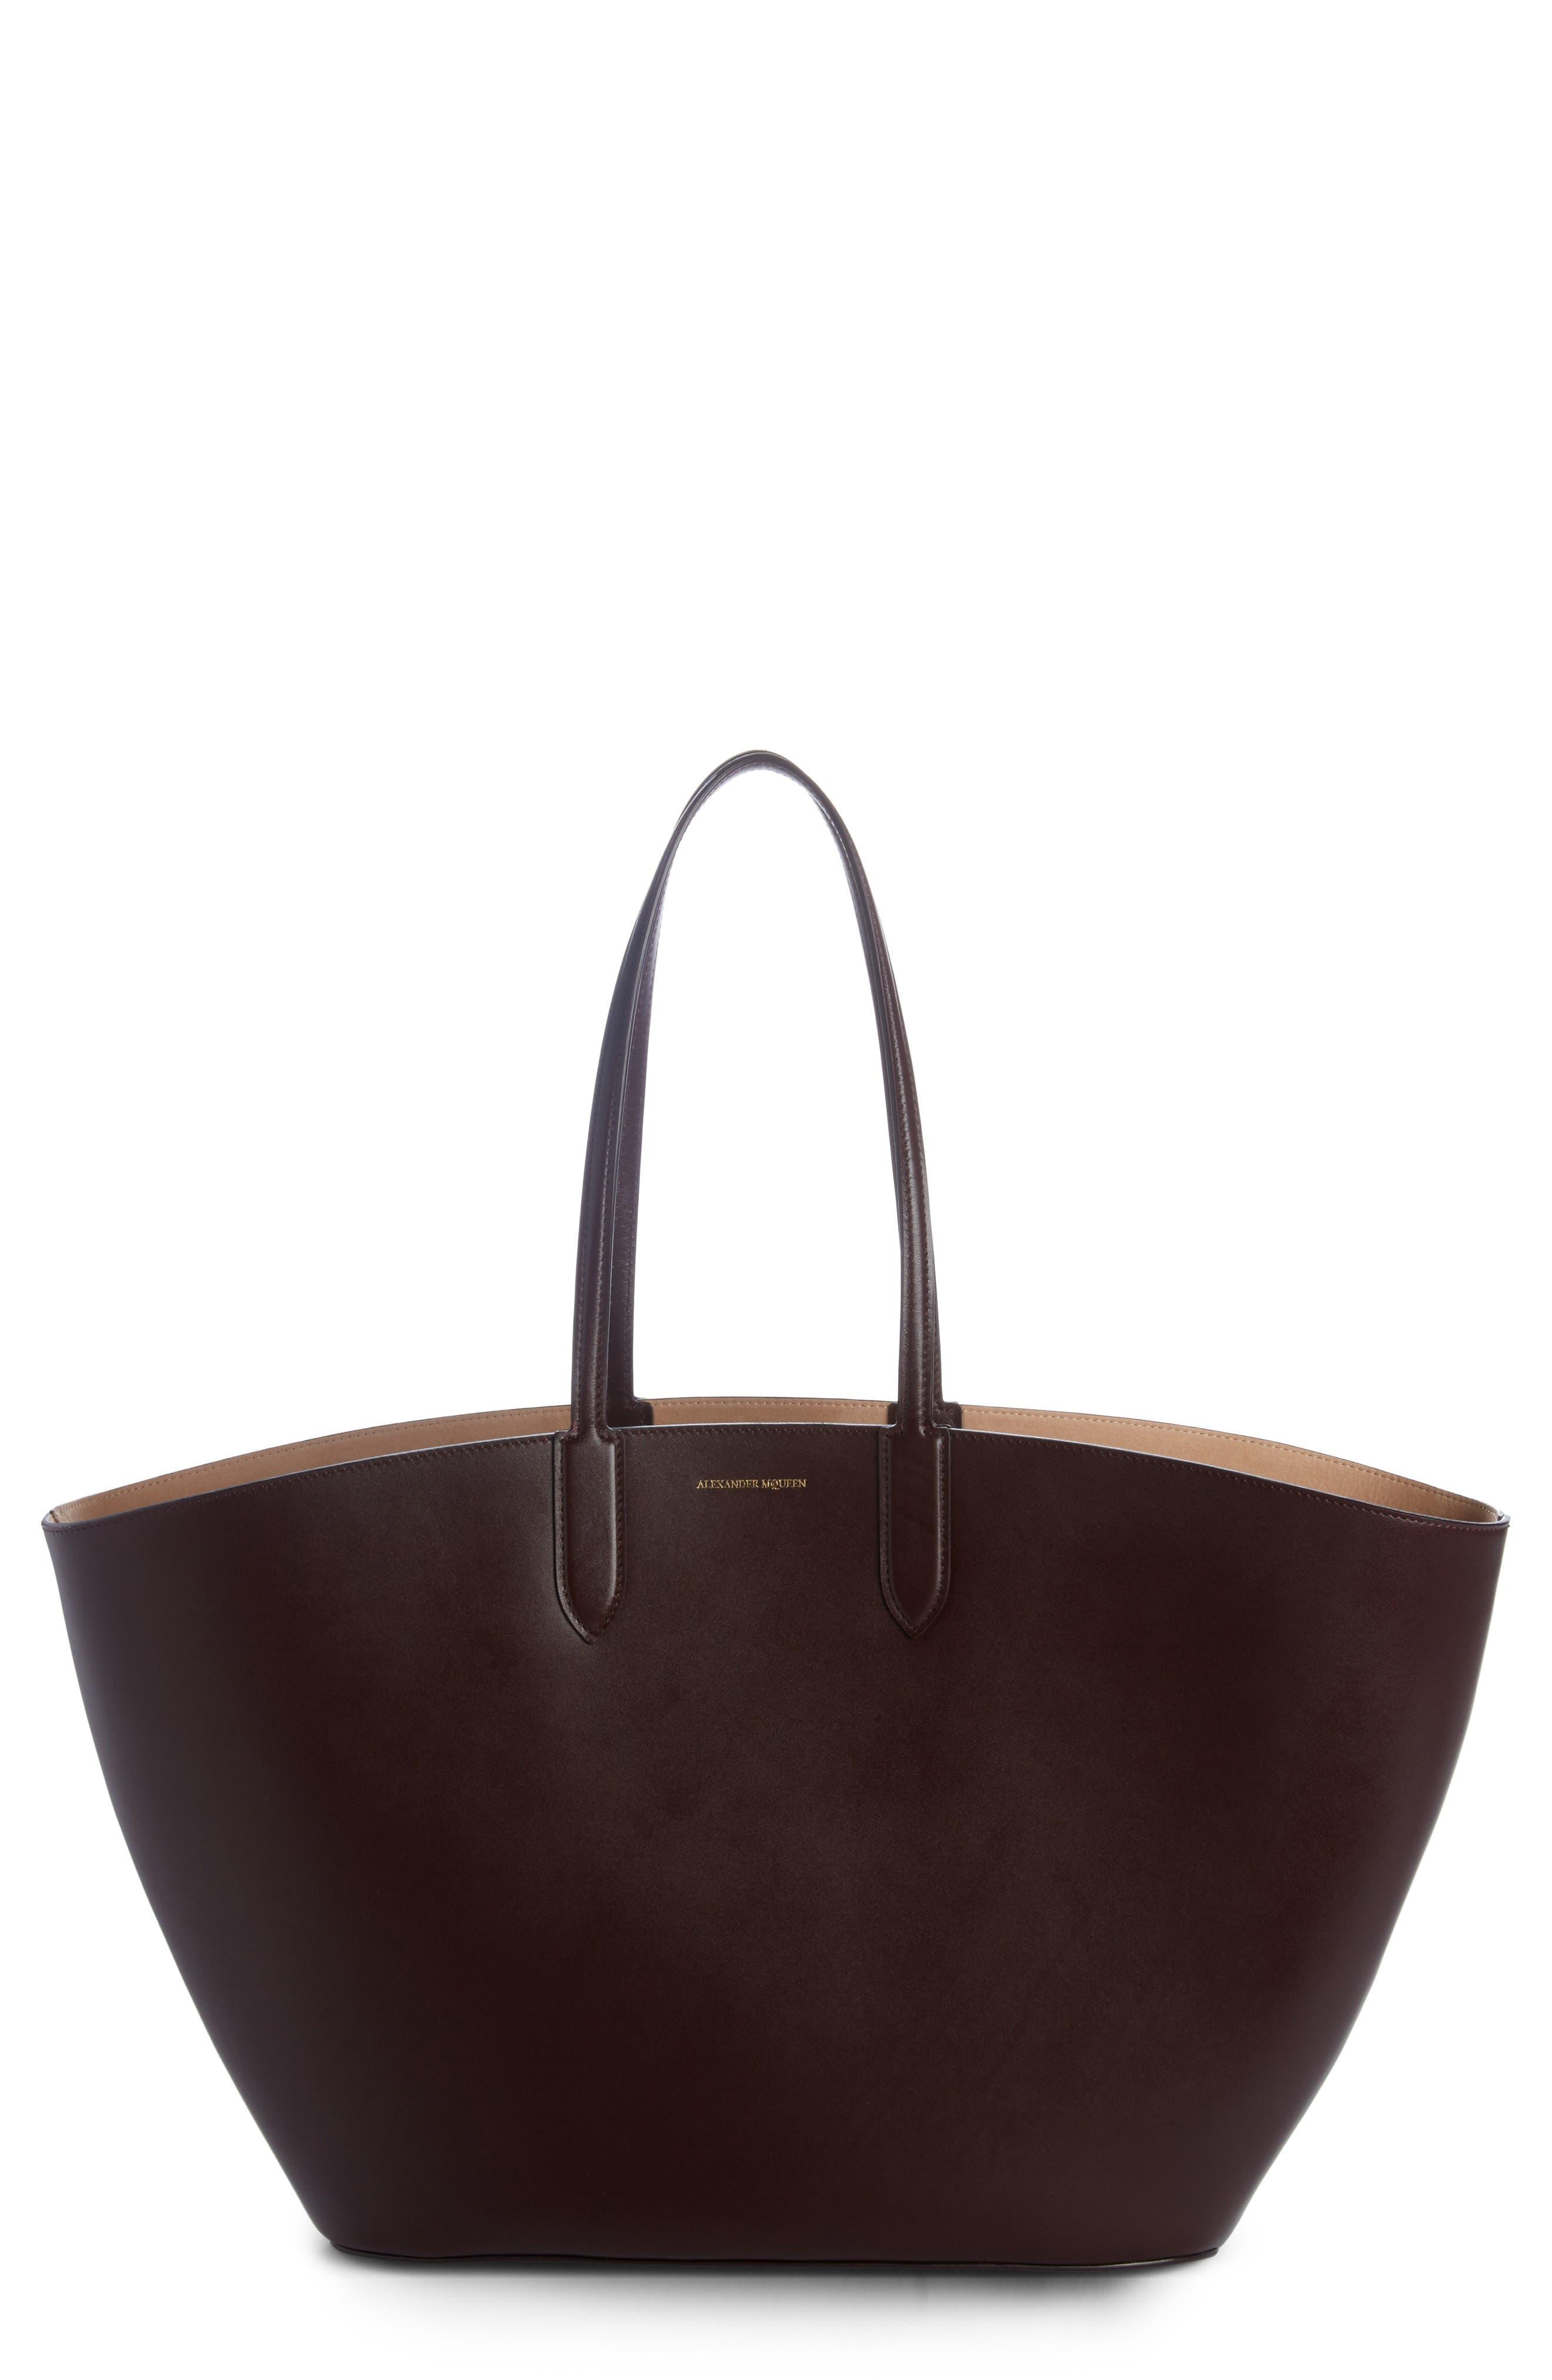 Alexander McQueen East/West Calfskin Leather Tote